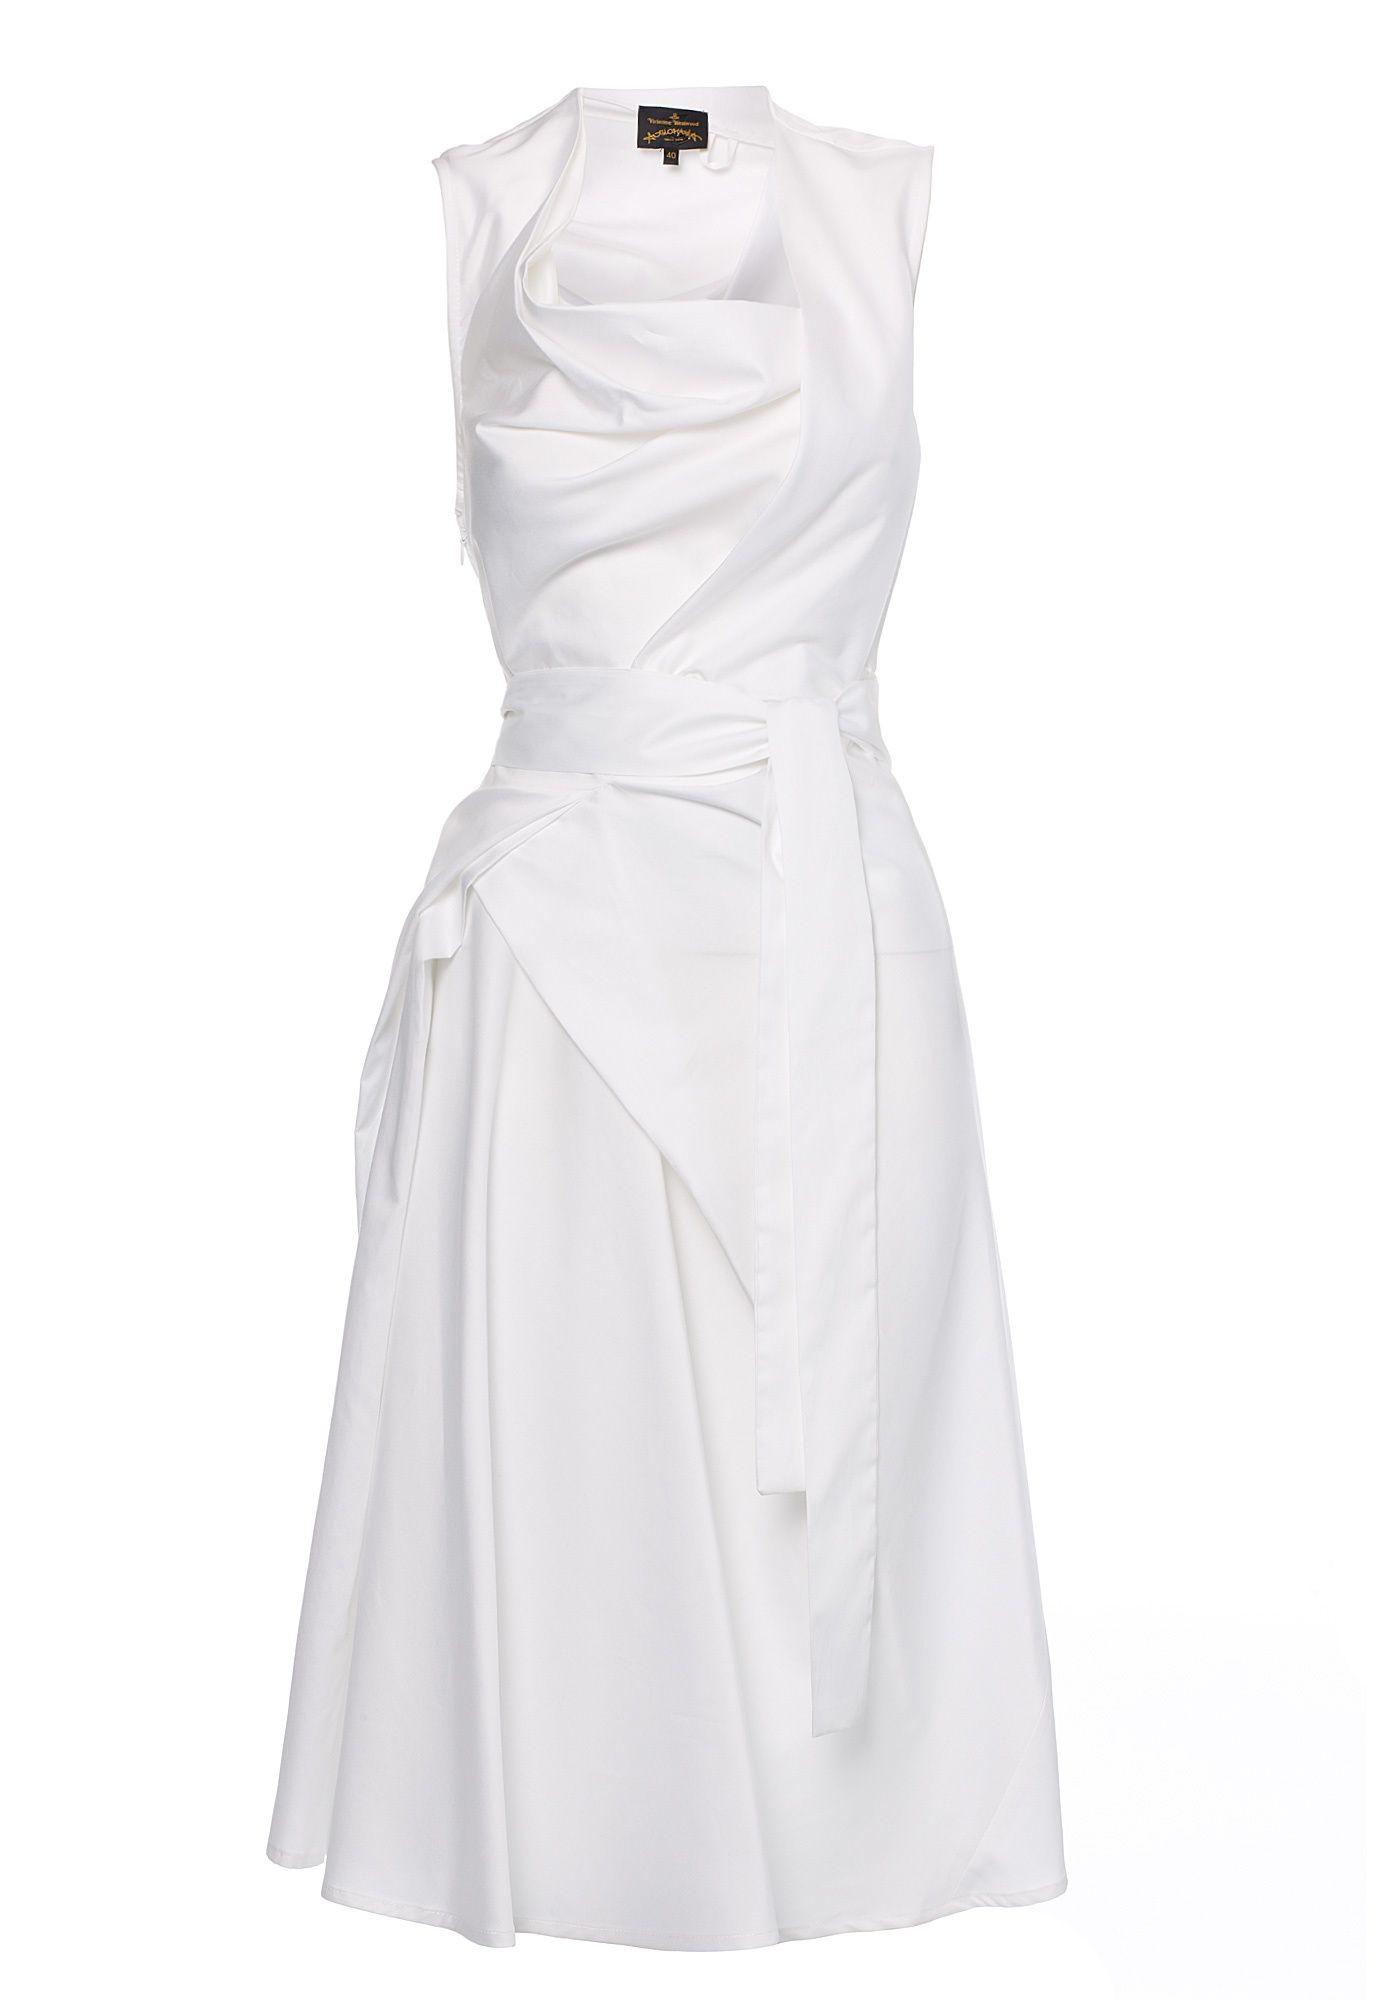 Apron Fish Dress White Fish Dress Vivienne Westwood Dress Dresses [ 2000 x 1384 Pixel ]